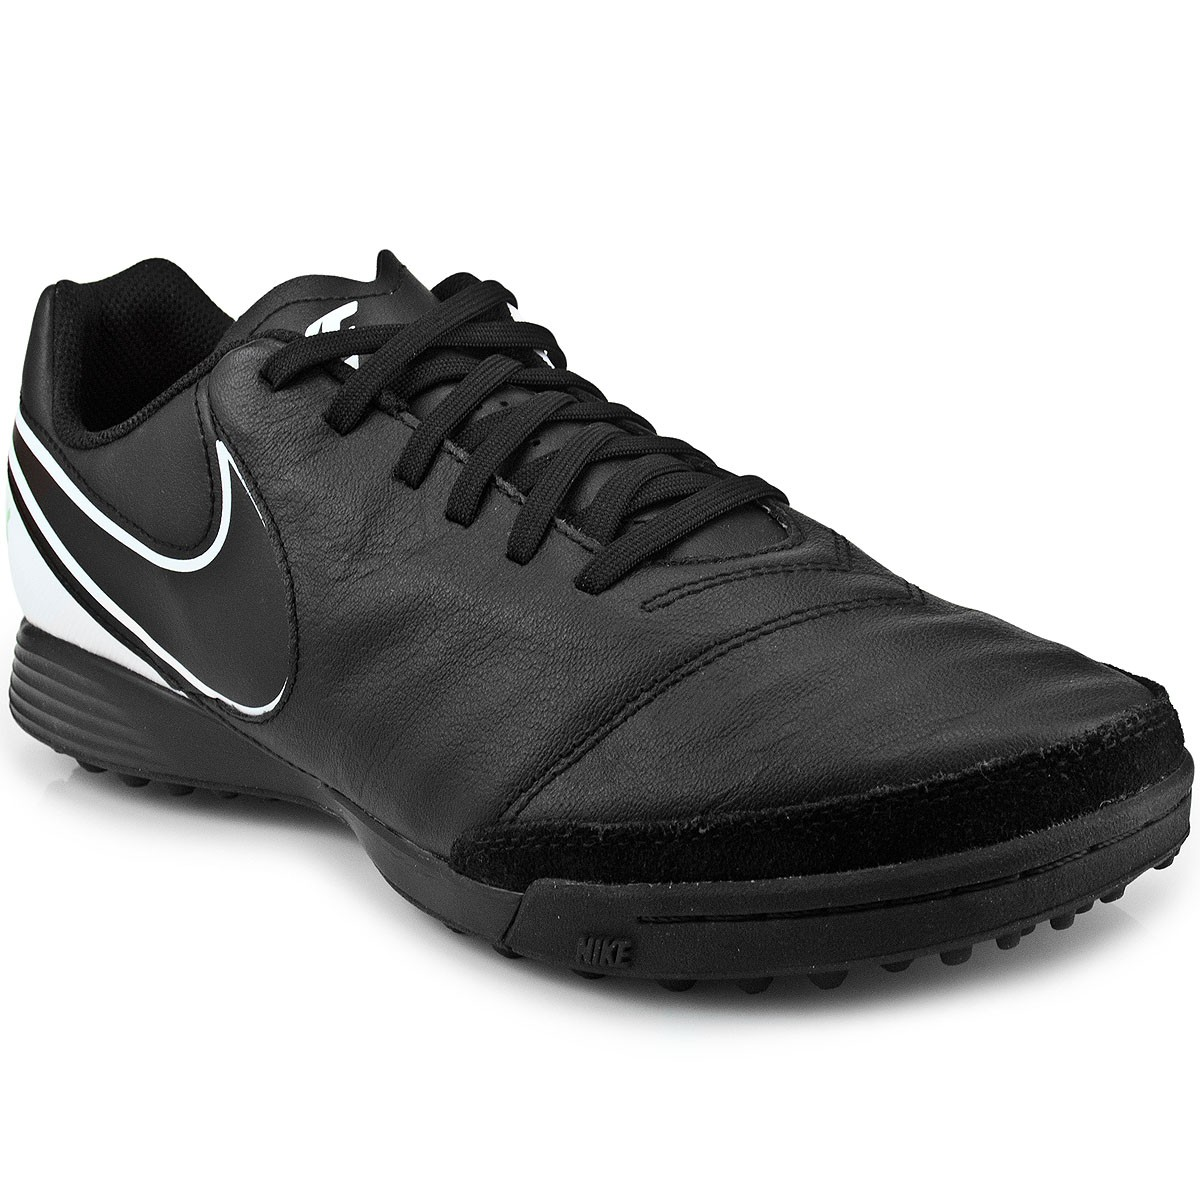 Chuteira Society Nike Tiempo Genio Ii Leather Tf fd7affeb9ef1d